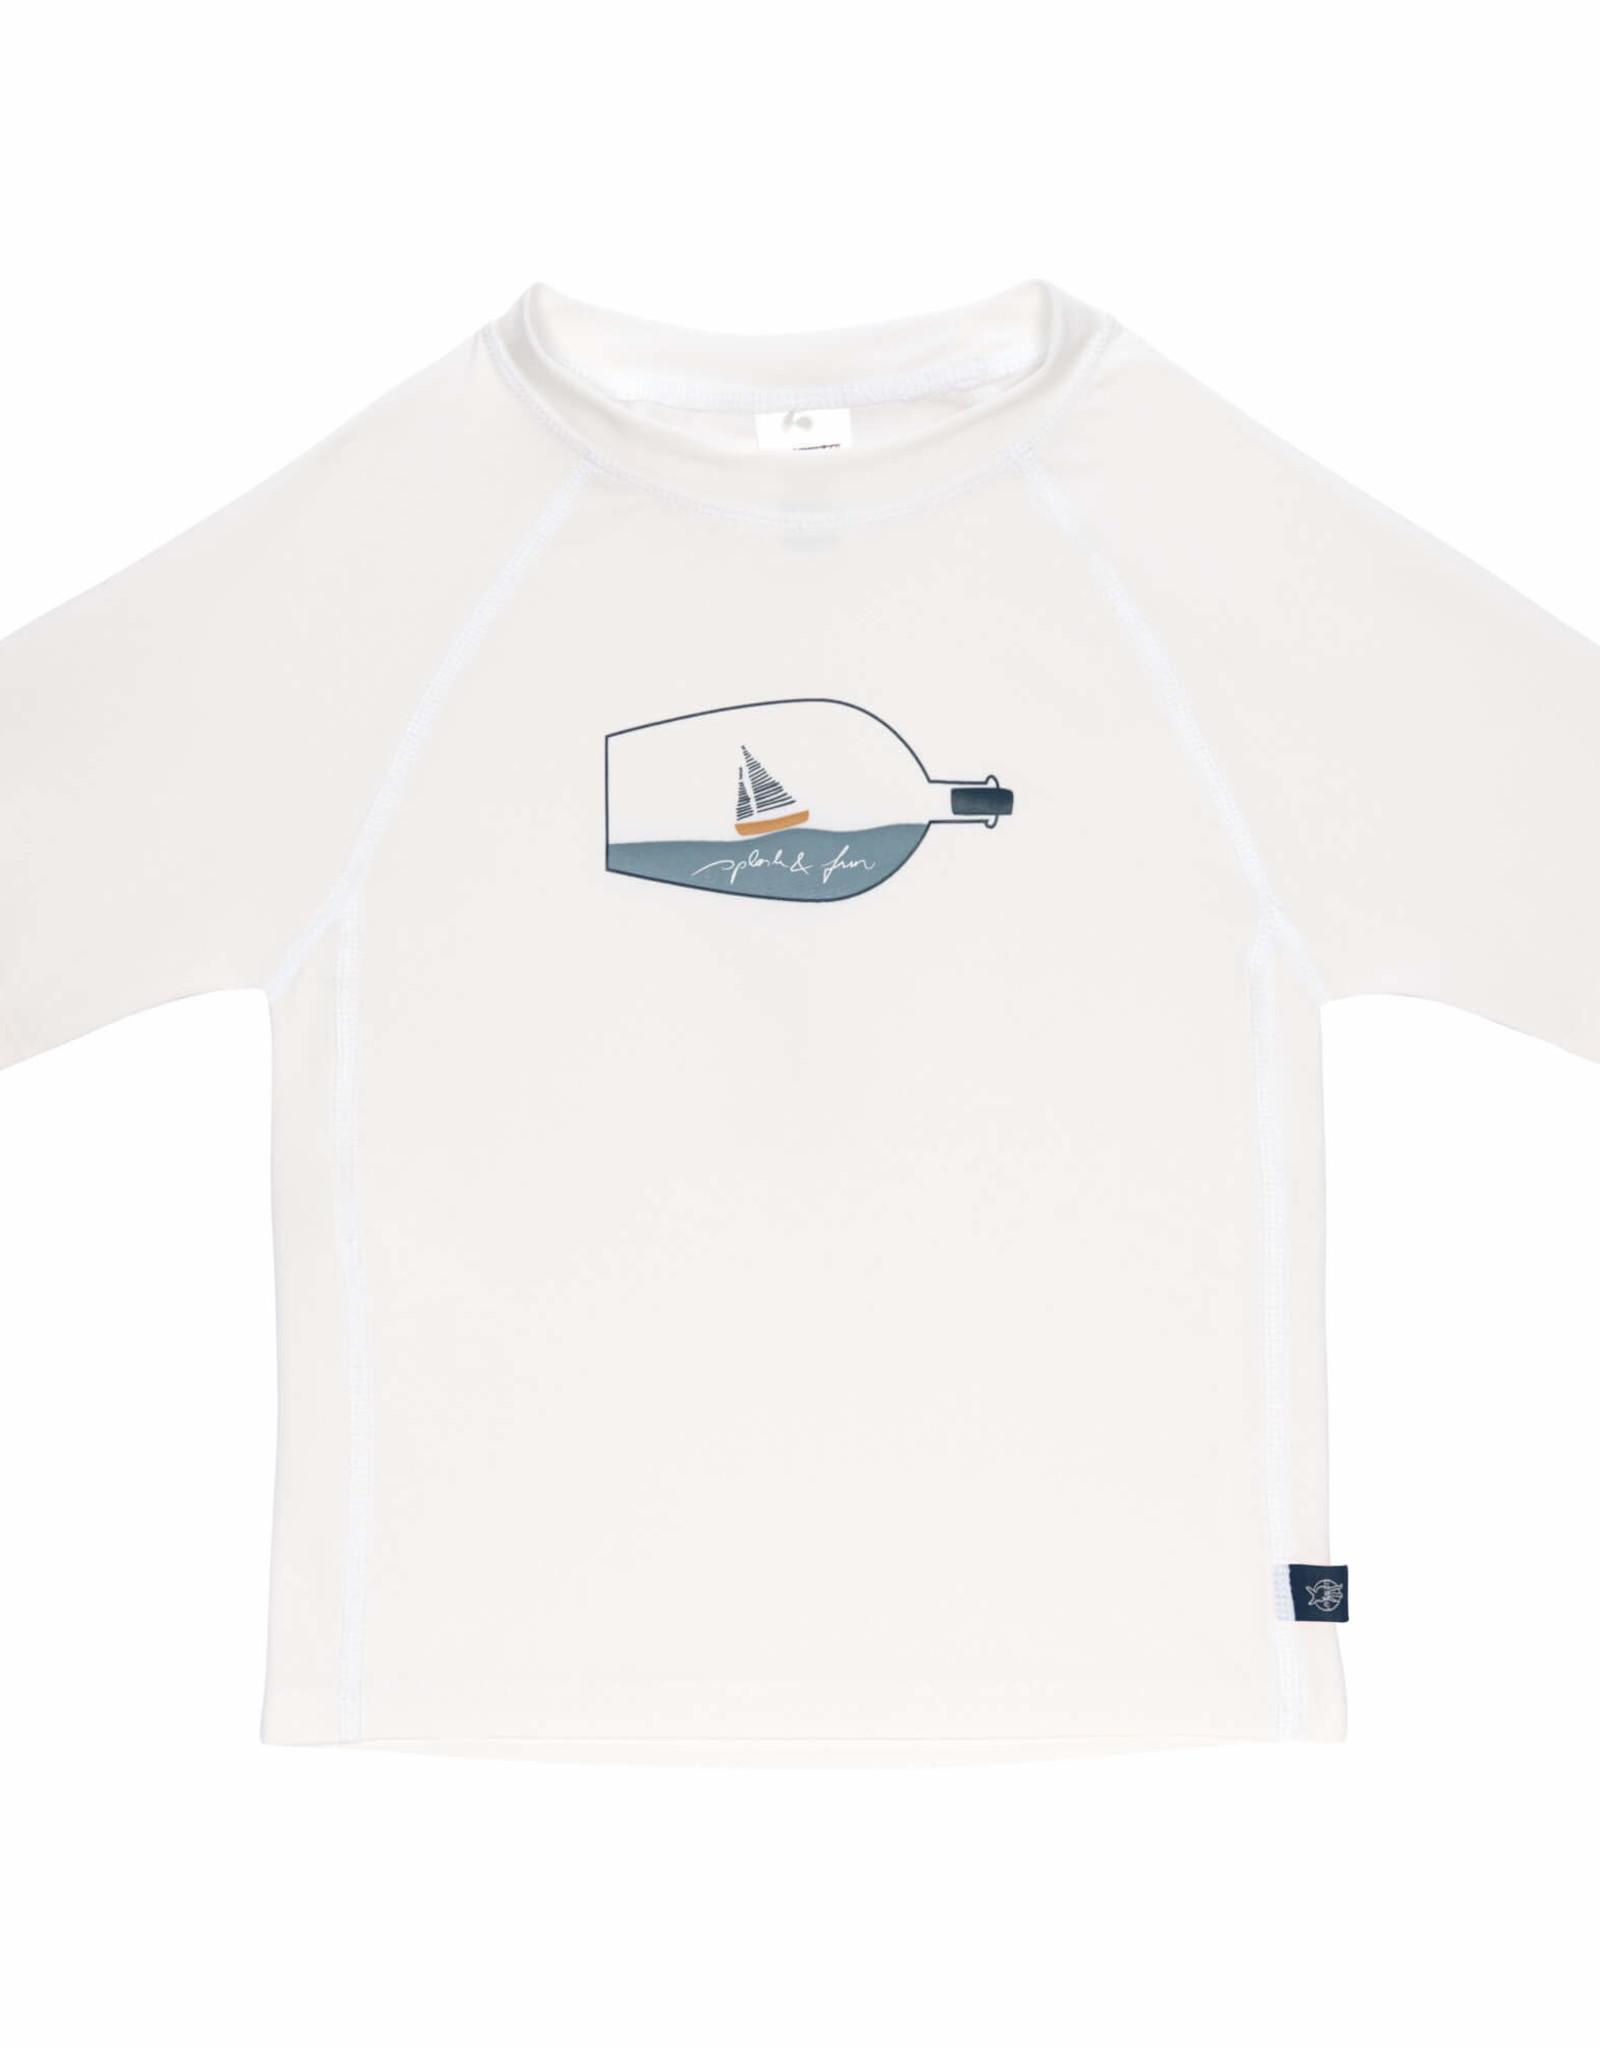 Lässig T-shirt KM ecru Ship in a bottle UV-50+